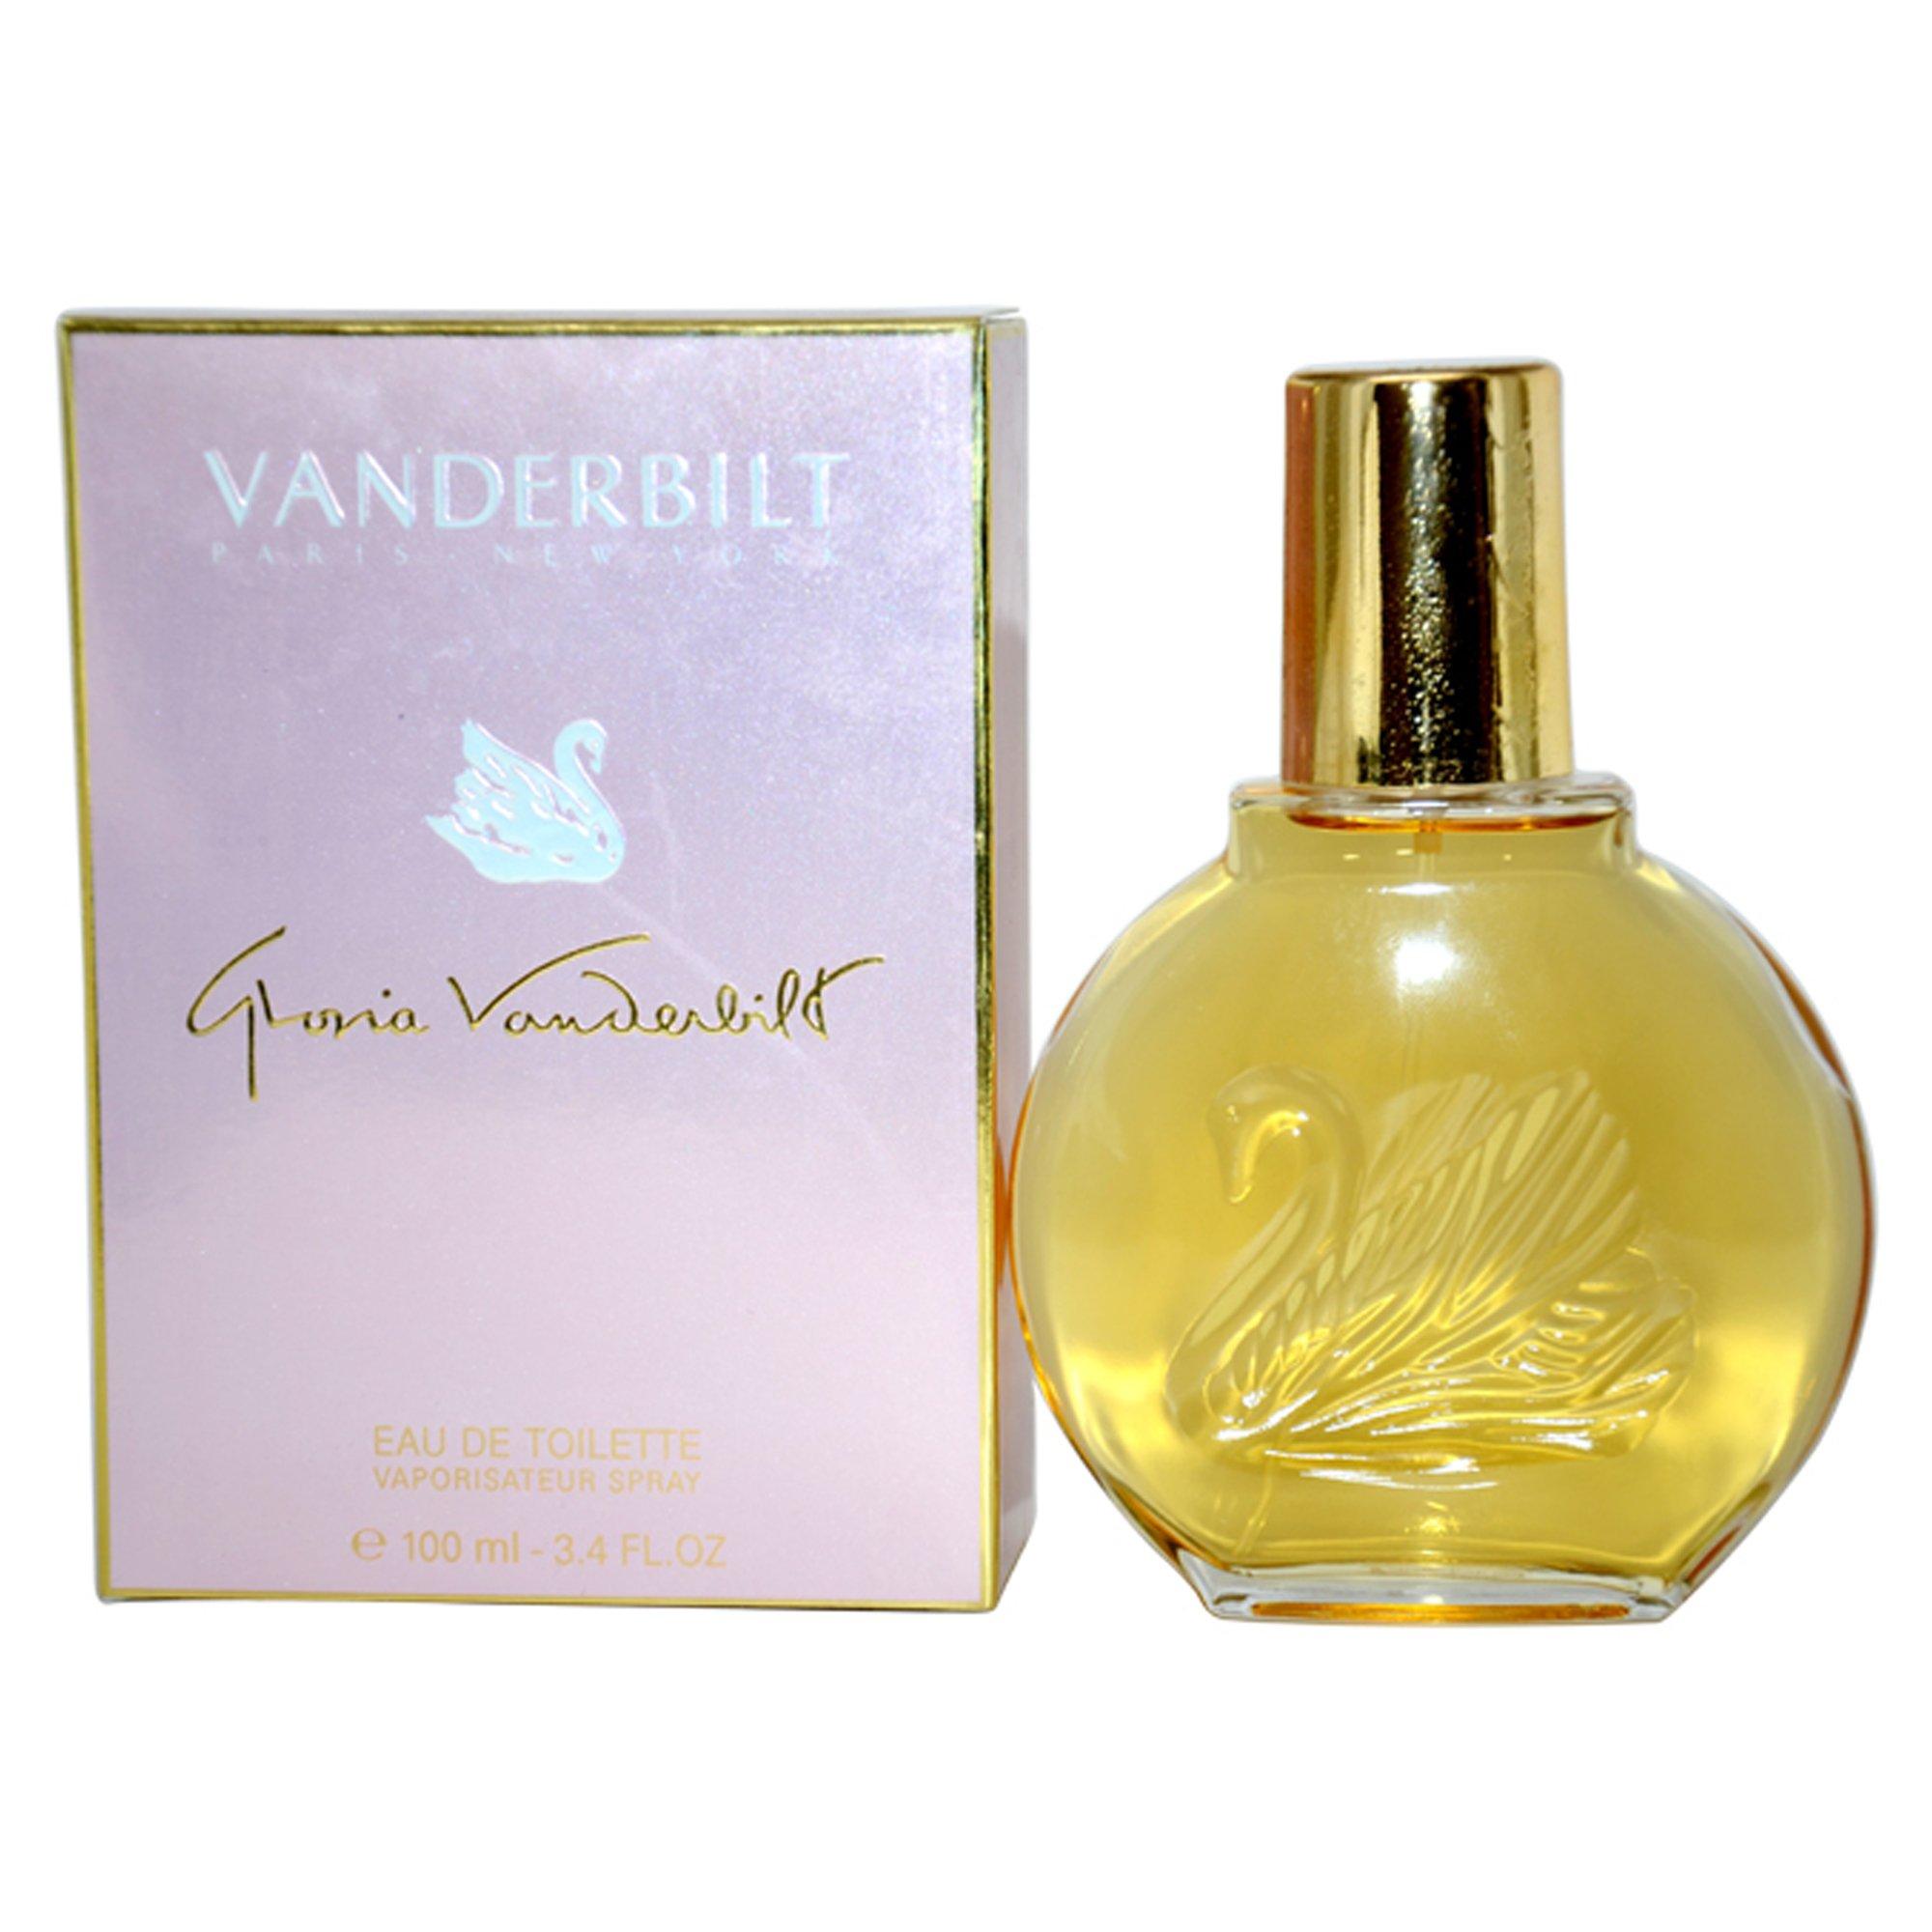 Gloria Vanderbilt for Women - 100ml EDT Spray by Gloria Vanderbilt